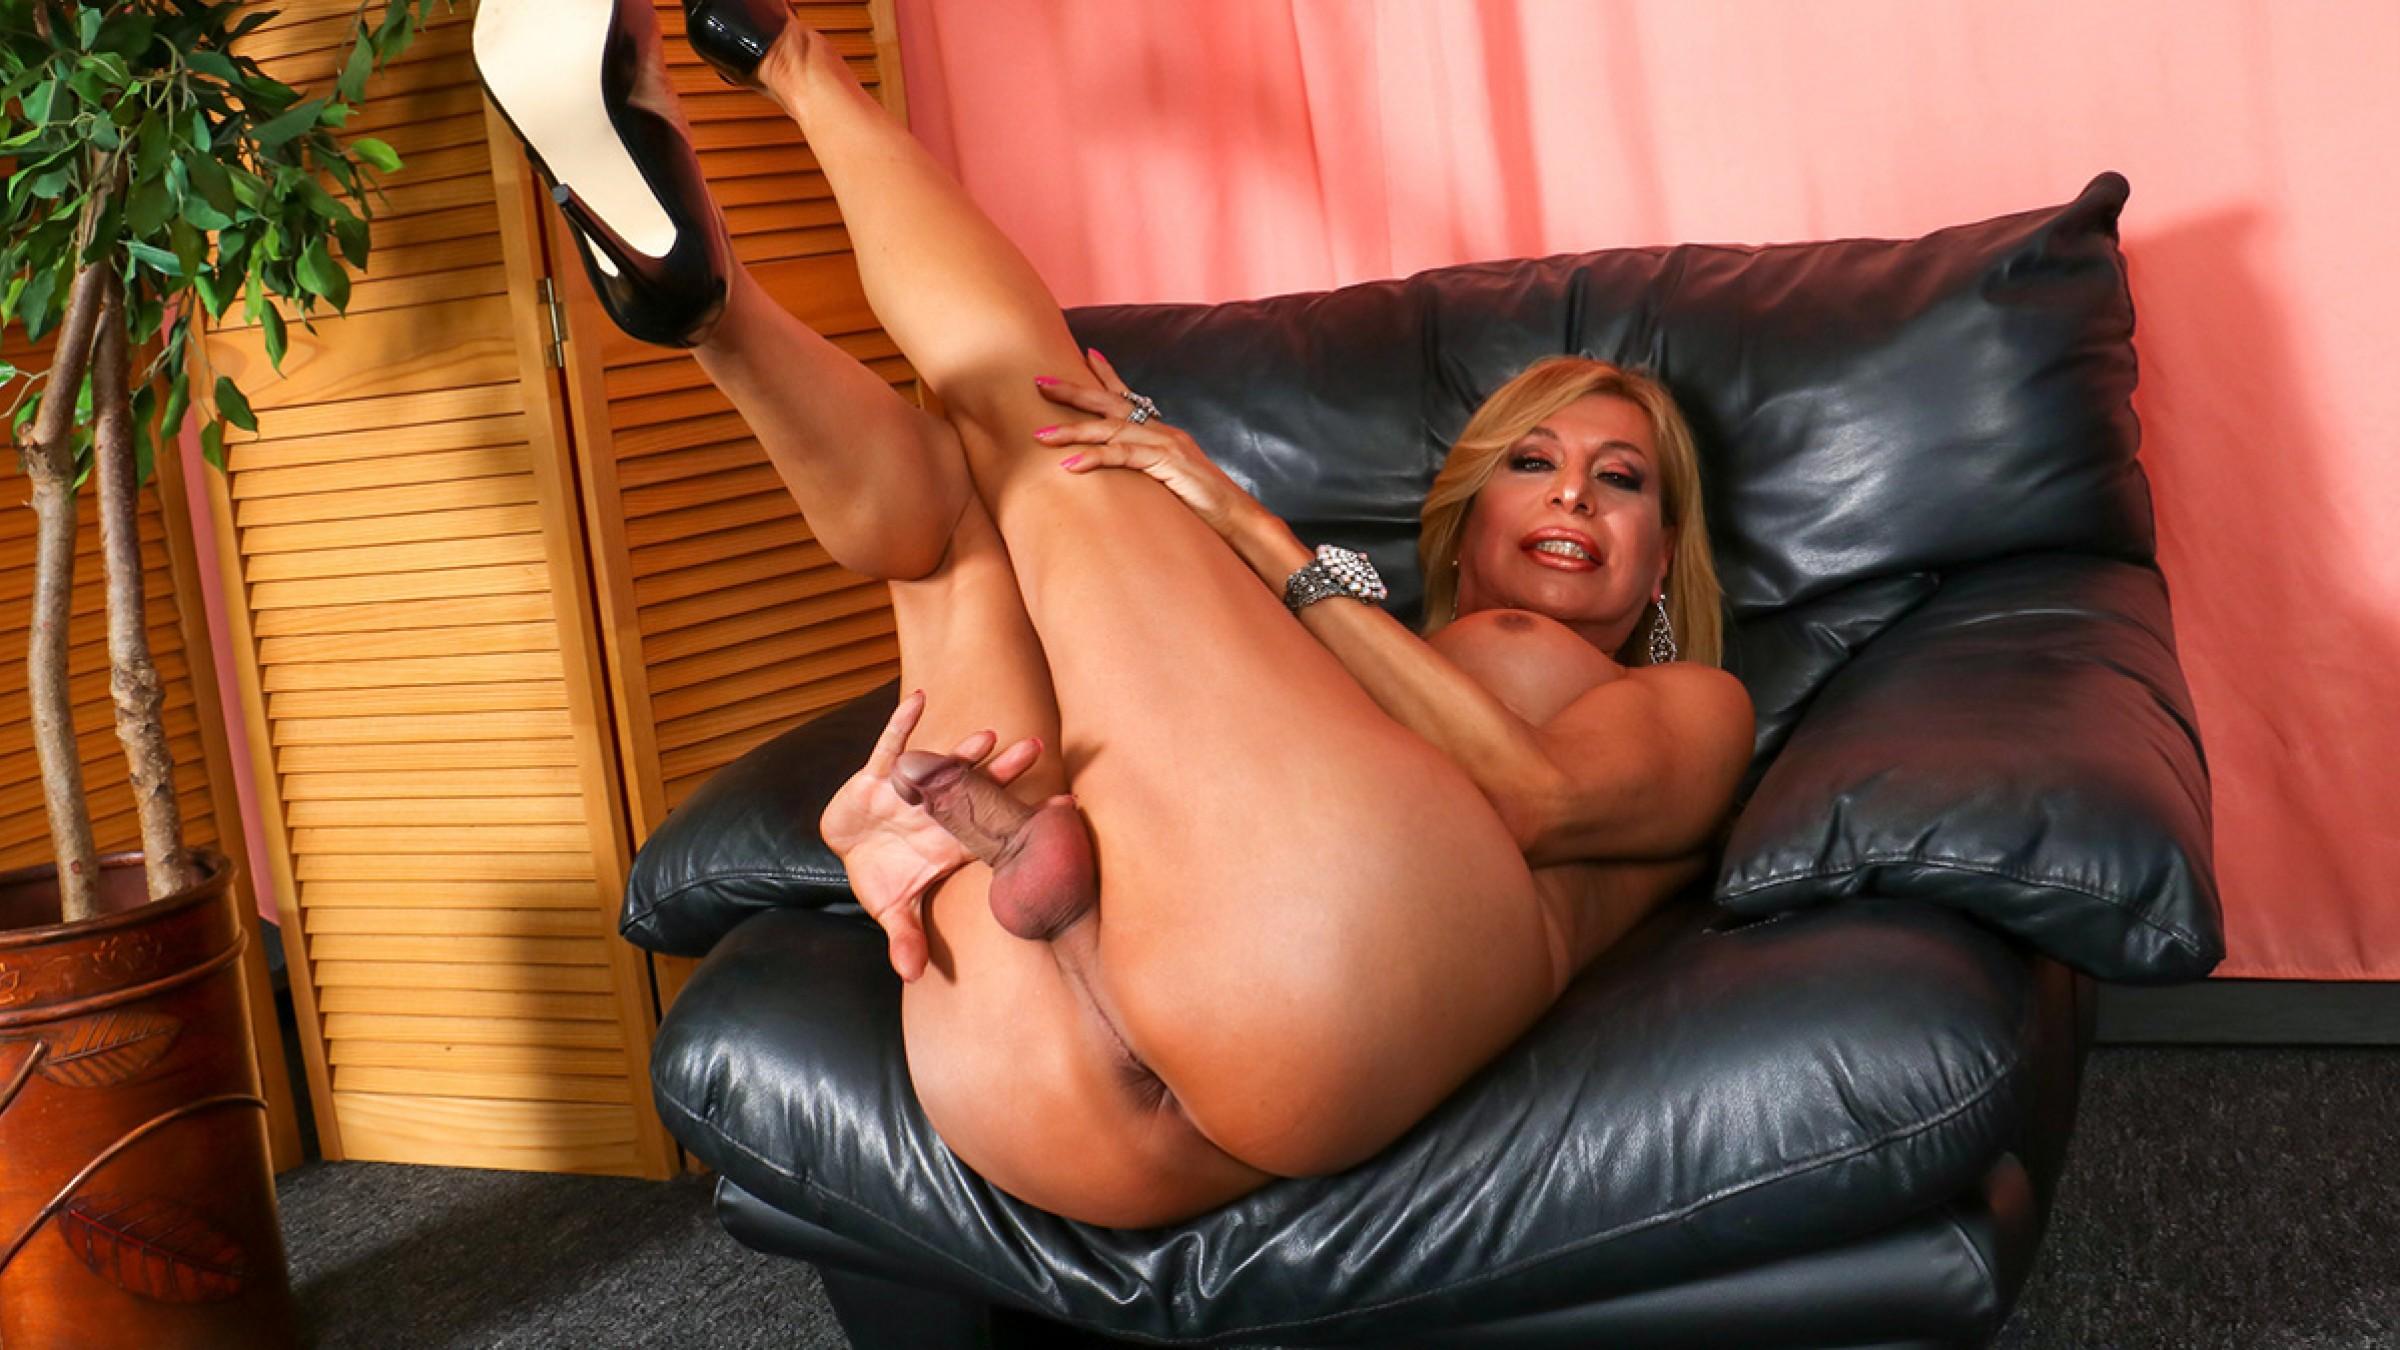 TGirl40 Fabiola Shows Herself Off!  Shemale XXX WEB-DL Groobynetwork